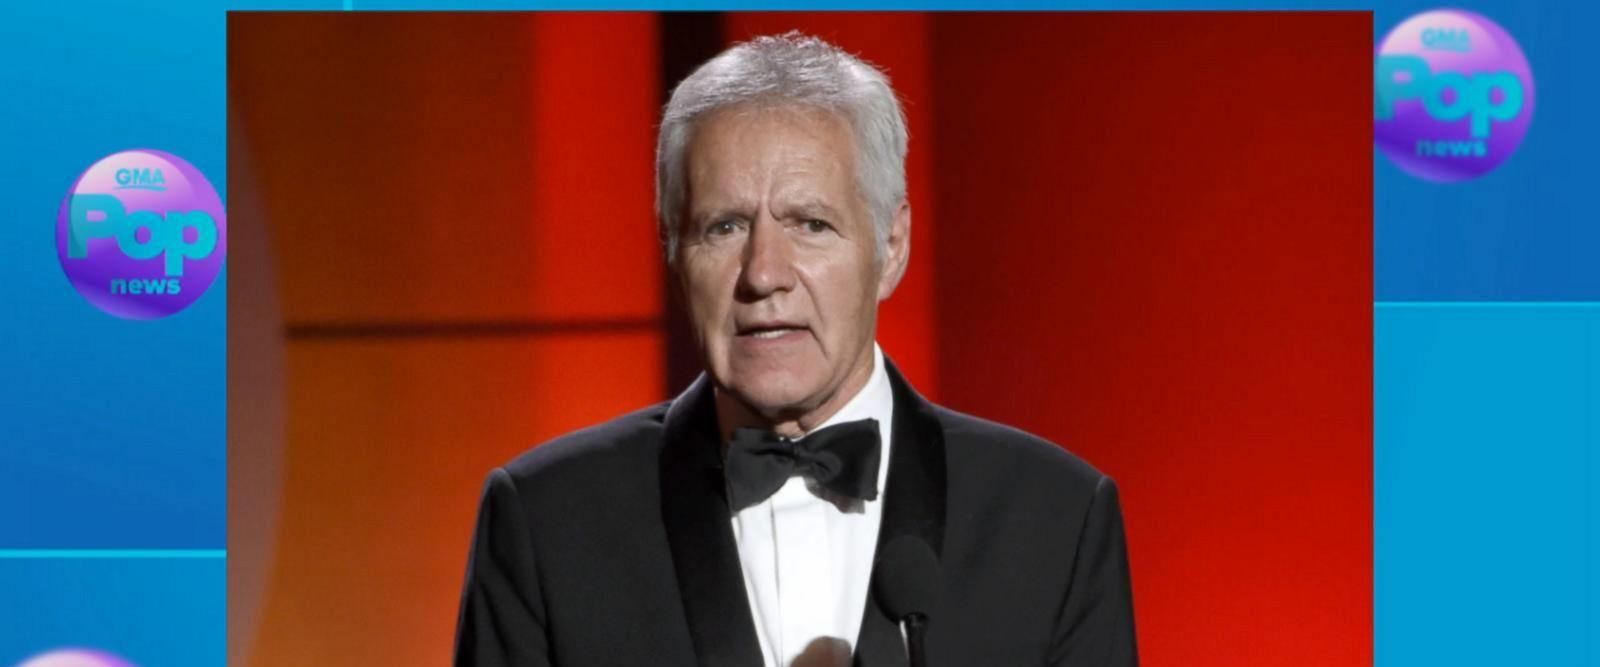 VIDEO: Jeopardy host Alex Trebek to moderate political debate